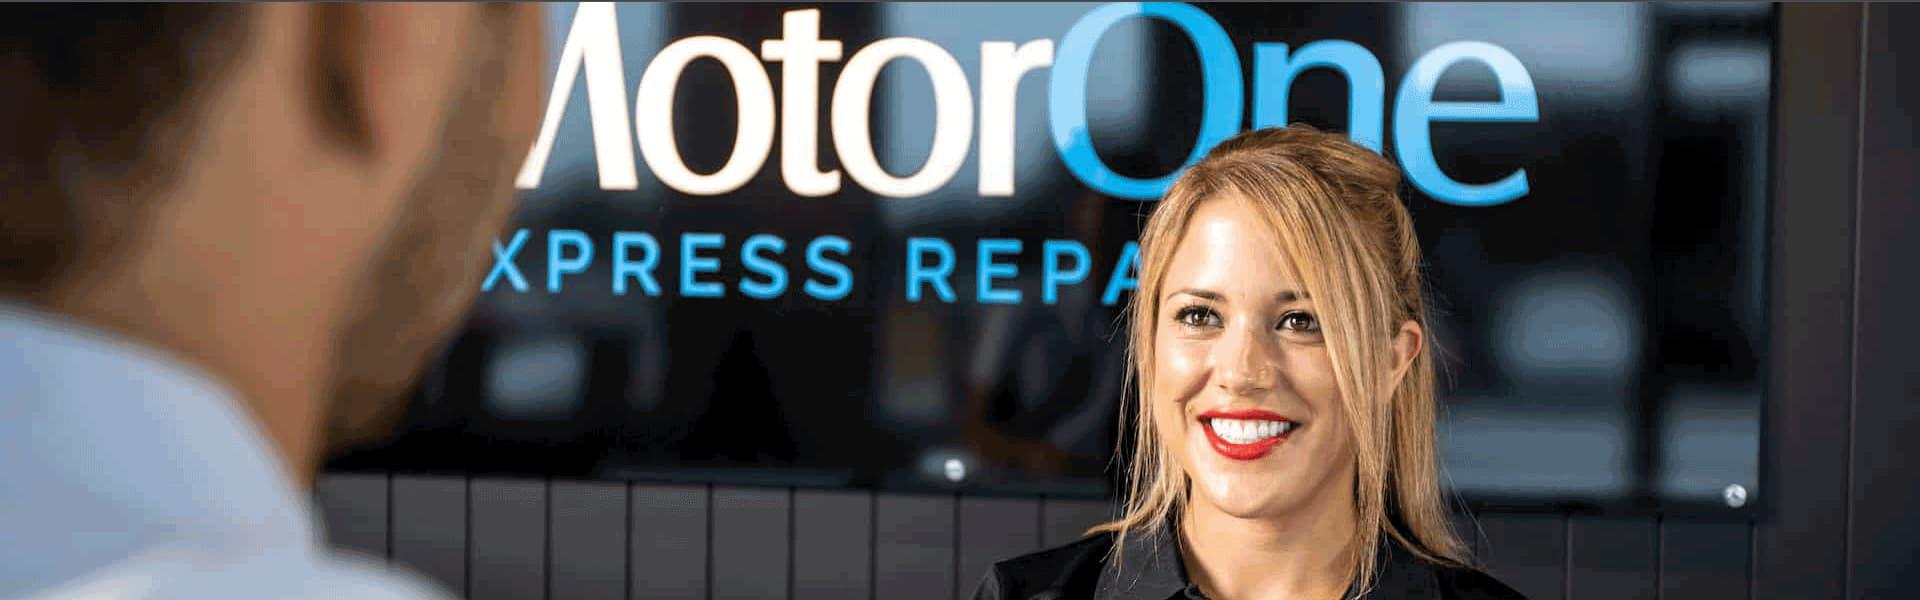 Contact MotorOne Express Repairs